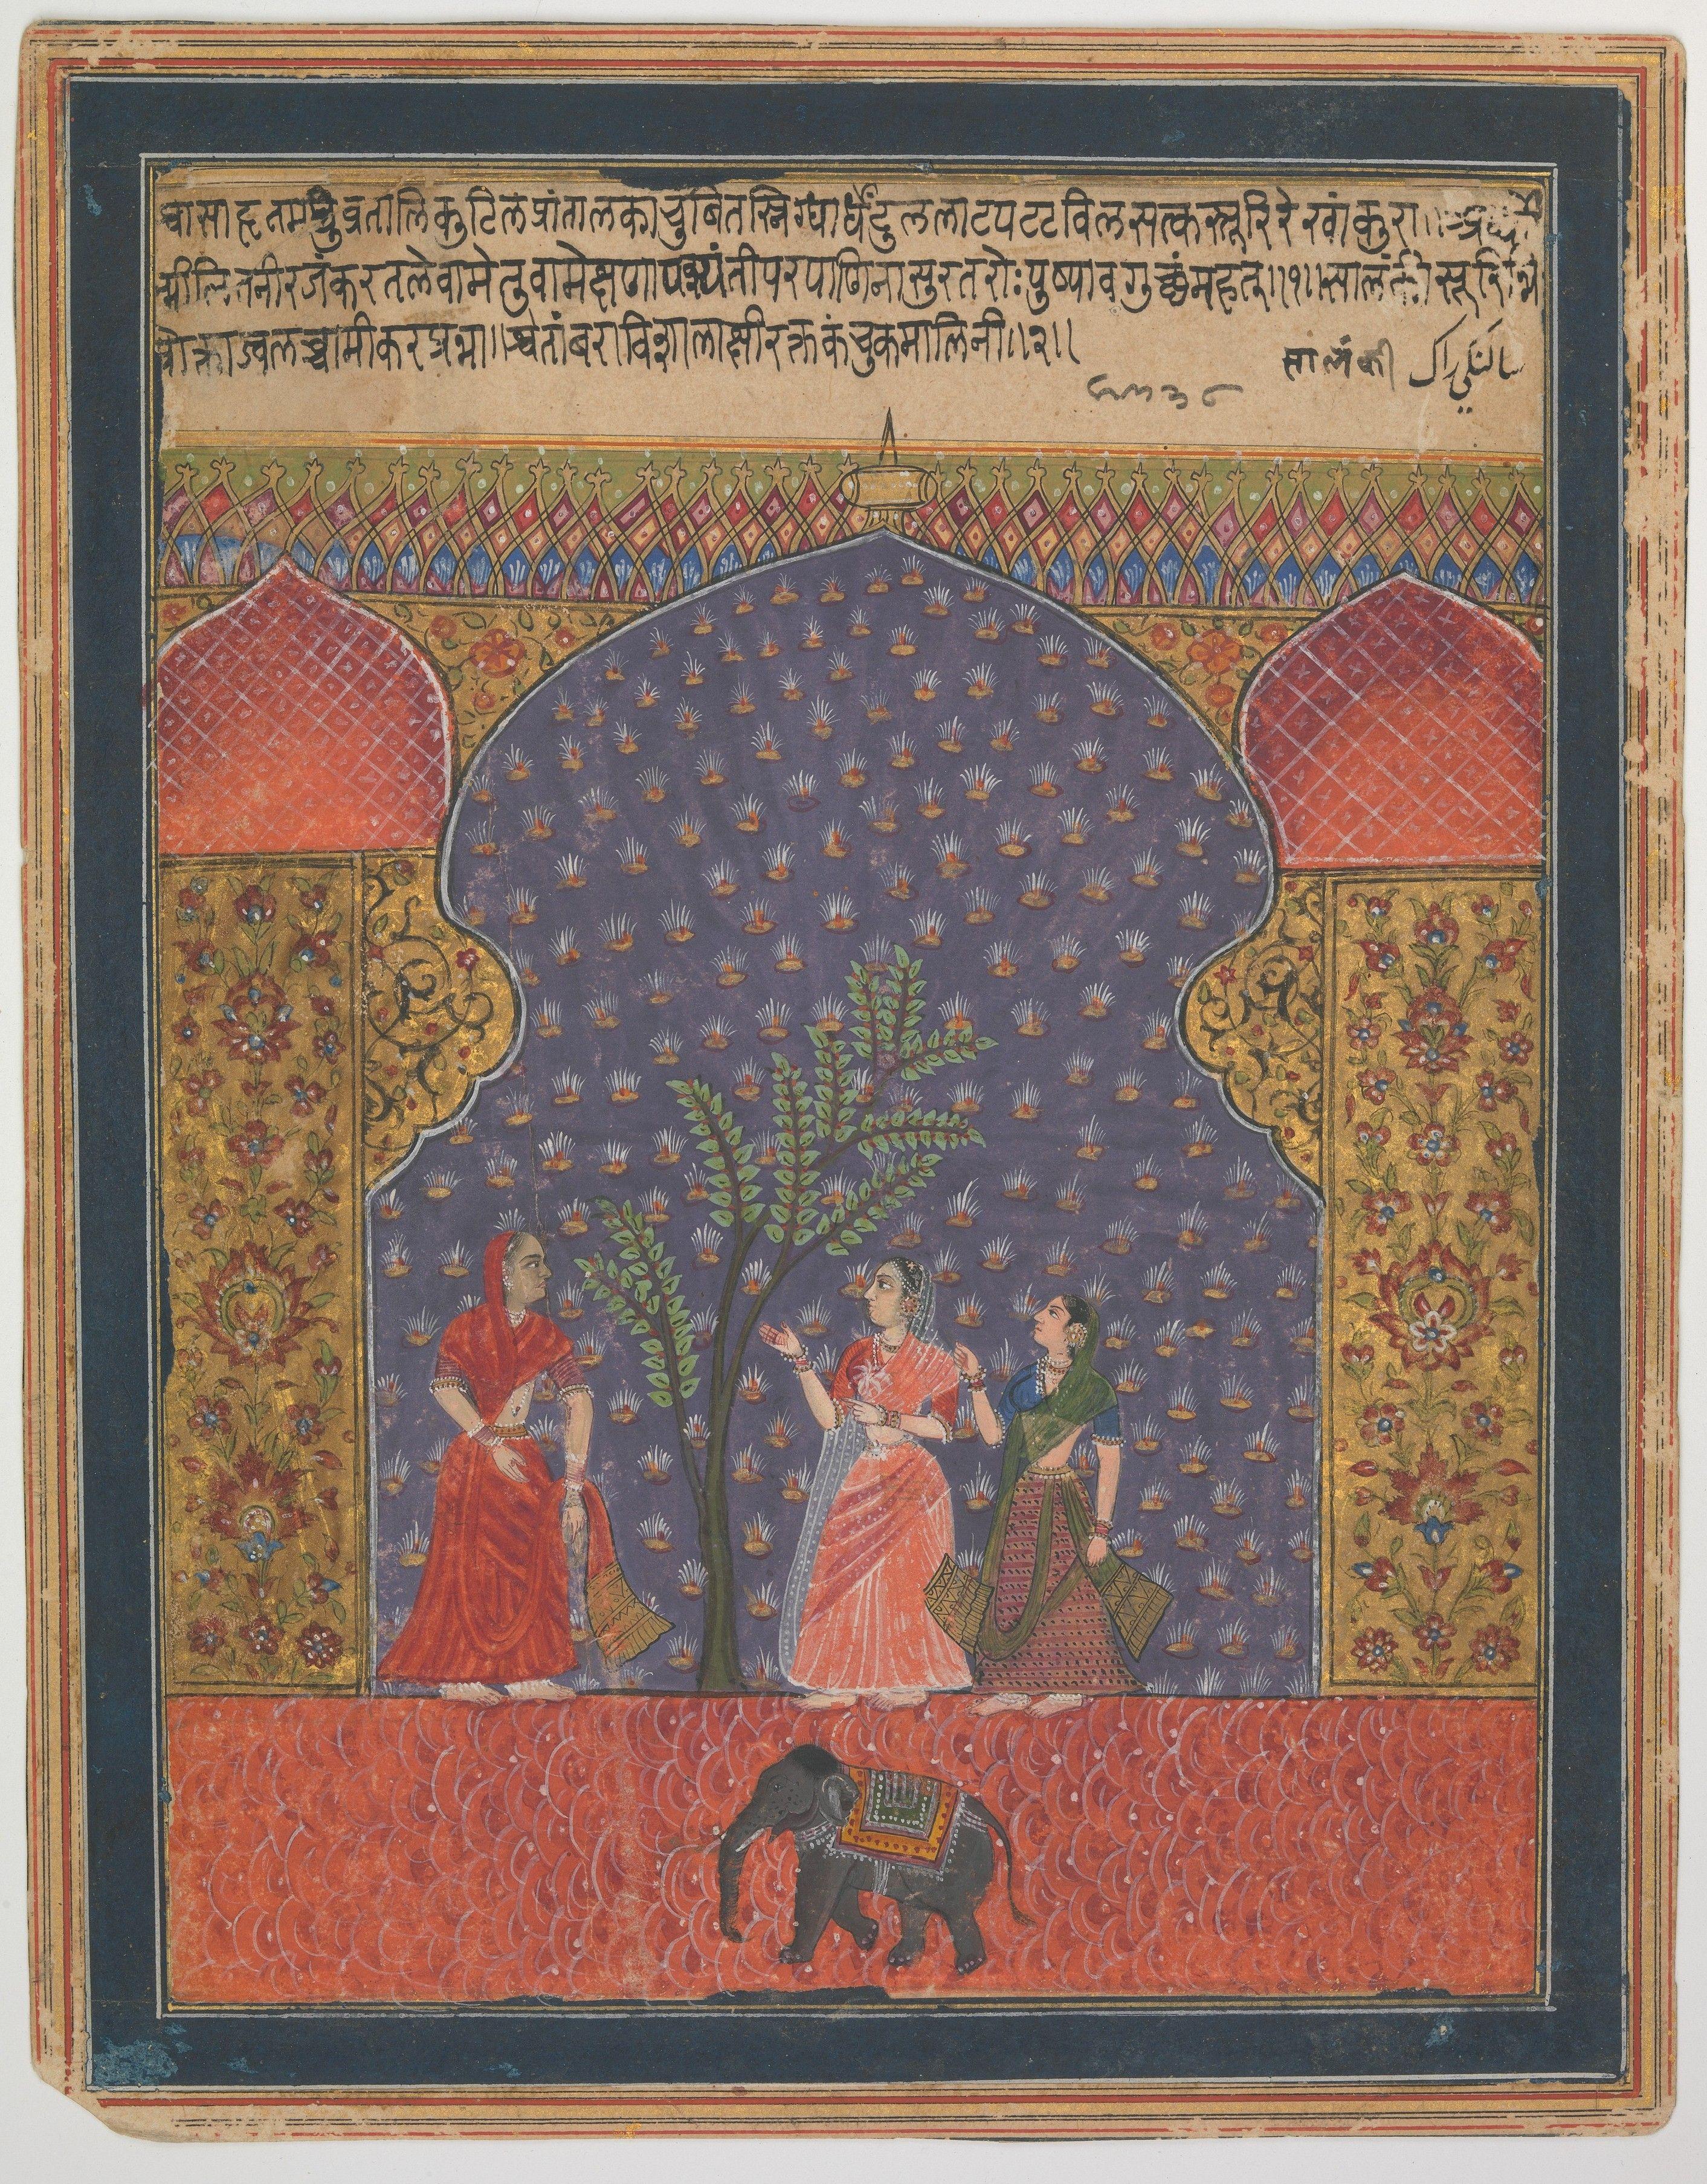 """Solanki Raga"", Folio from a Ragamala Object Name: Folio from an illustrated manuscript Date: ca. 1590 Geography: India, Deccan, probably Ahmadnagar"